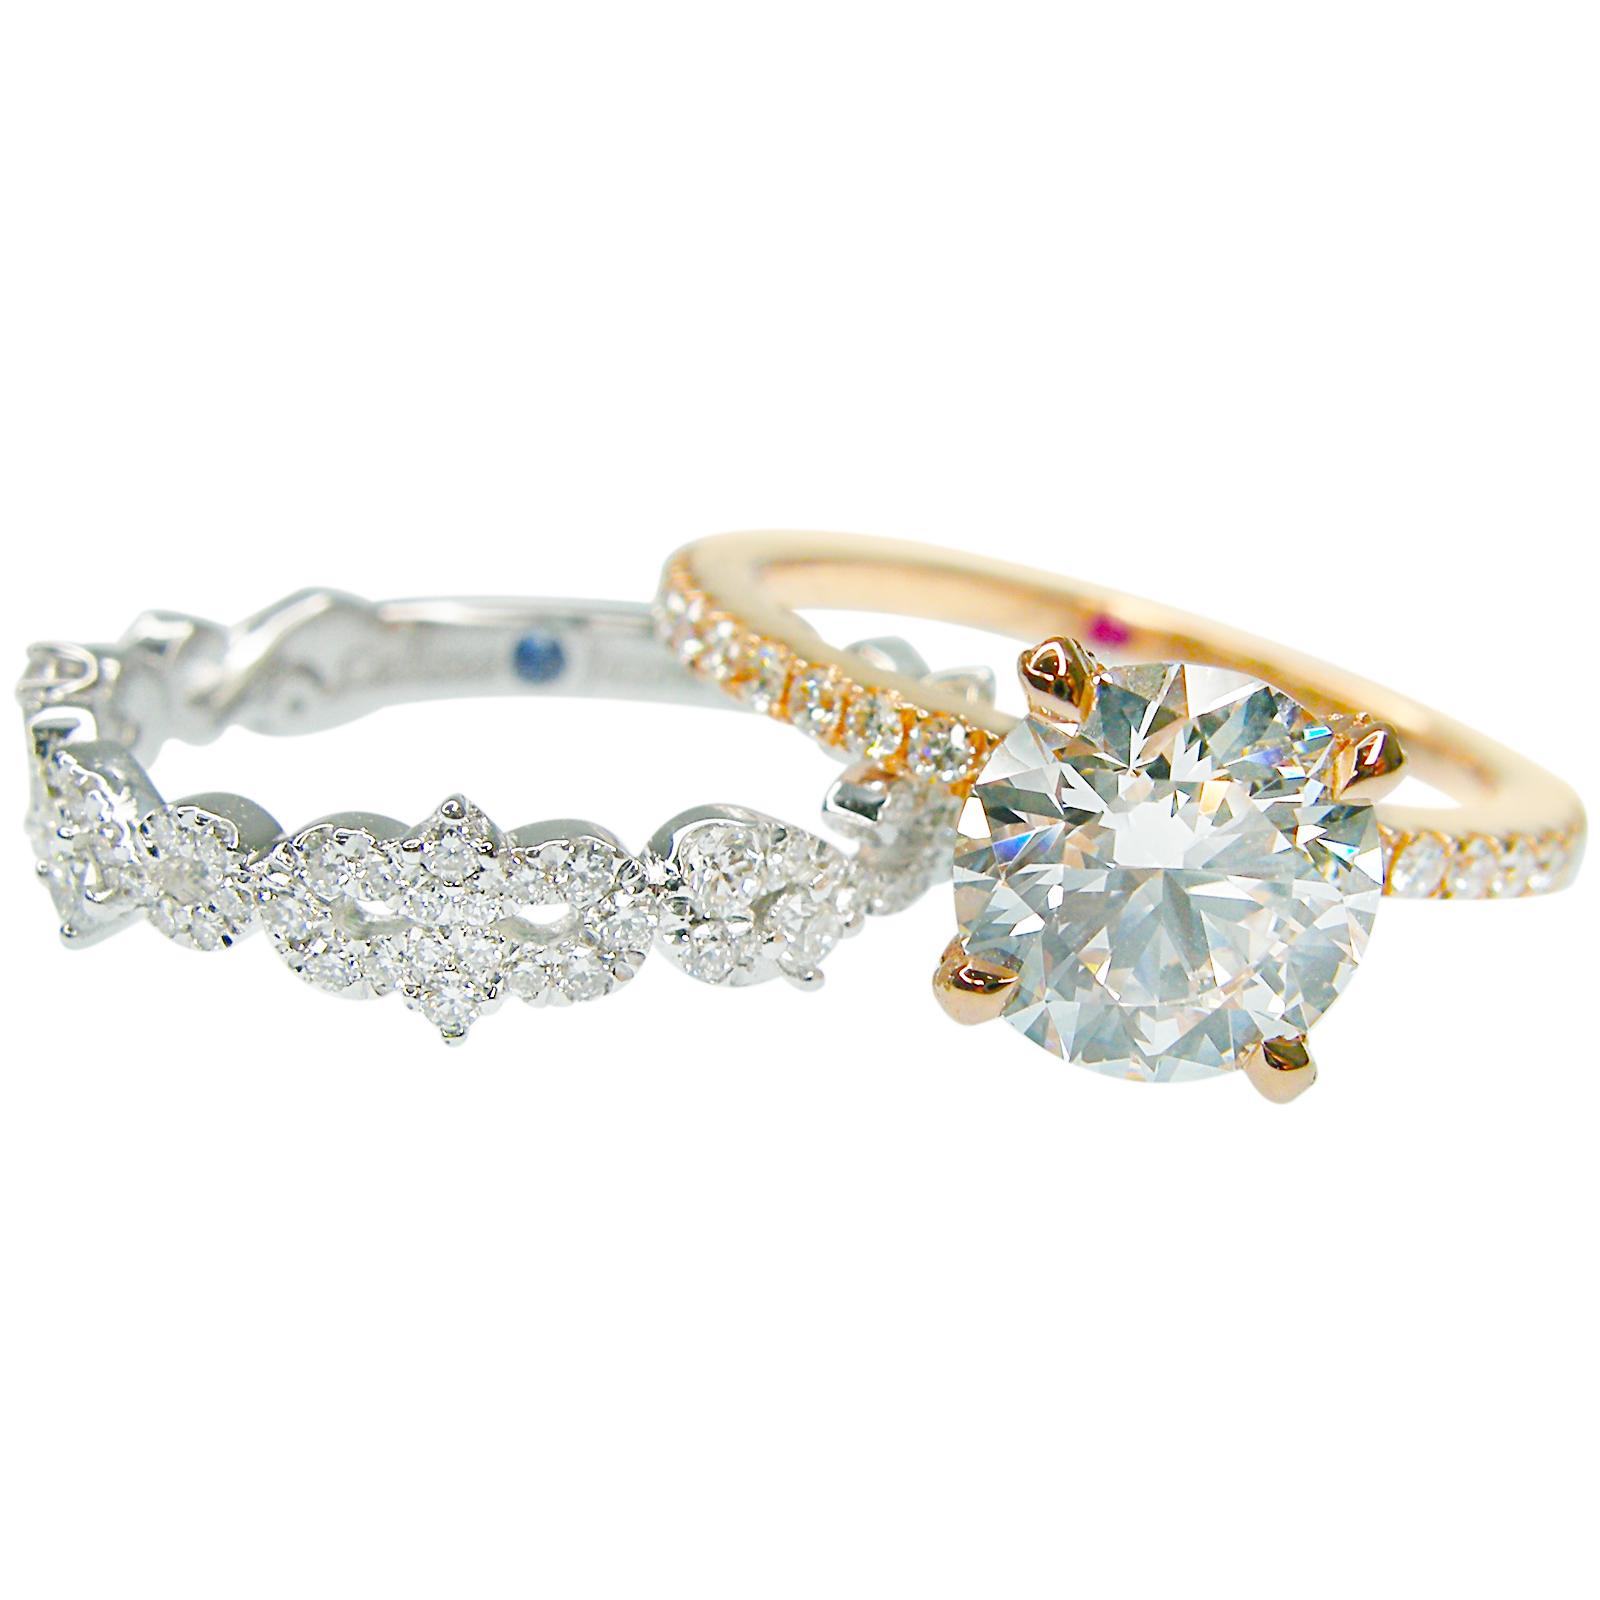 SOLITAIRE AND SIGNATURE DIAMOND WEDDING BAND SET